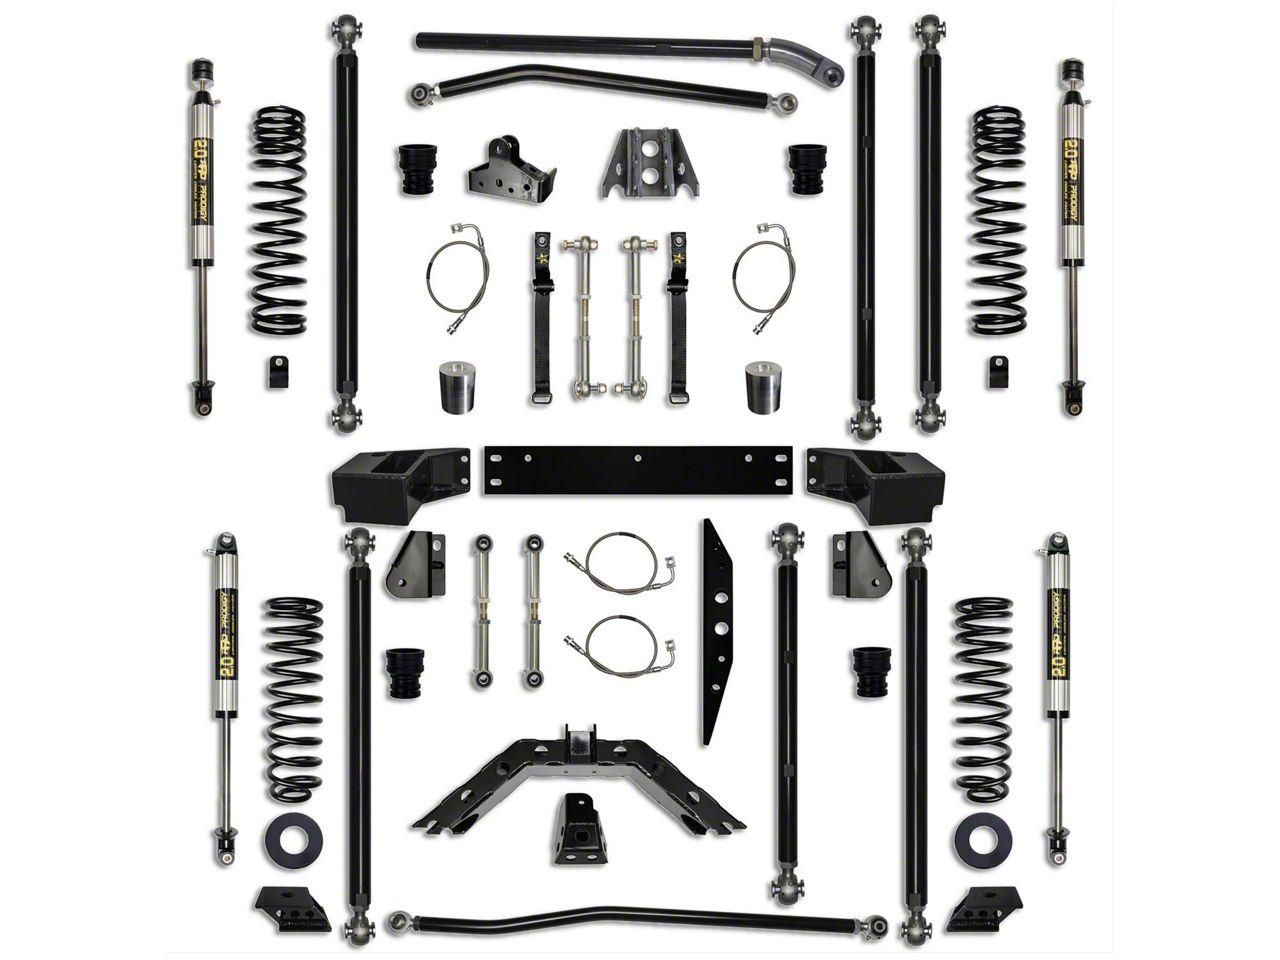 Rock Krawler 4.5 in. Off-Road Pro Long Arm Suspension Lift Kit - Stage 1 (07-18 Jeep Wrangler JK 2 Door)